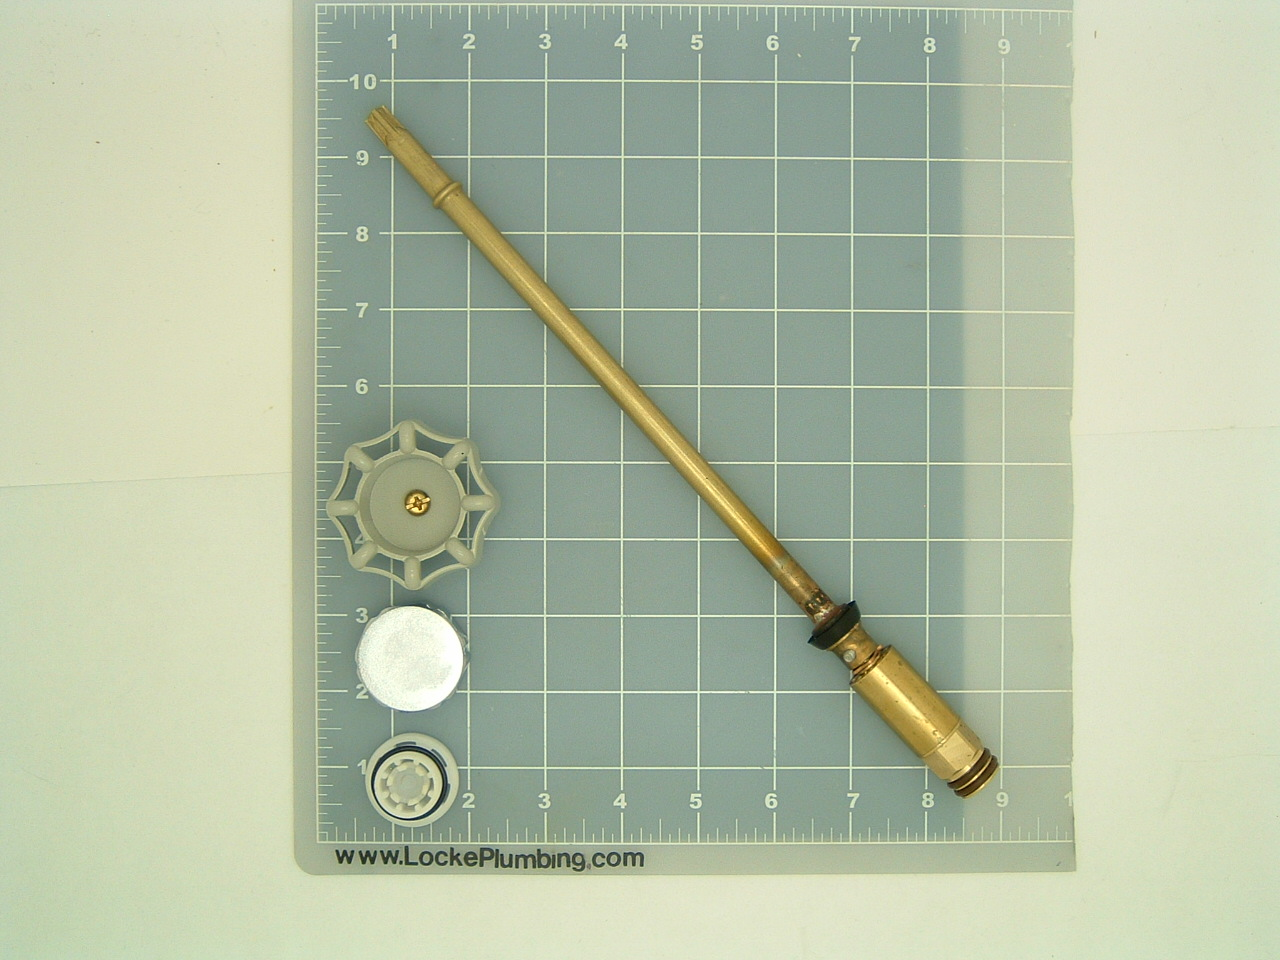 Mansfield Anti Siphon Outdoor Faucet Repair Kit Outdoor Ideas